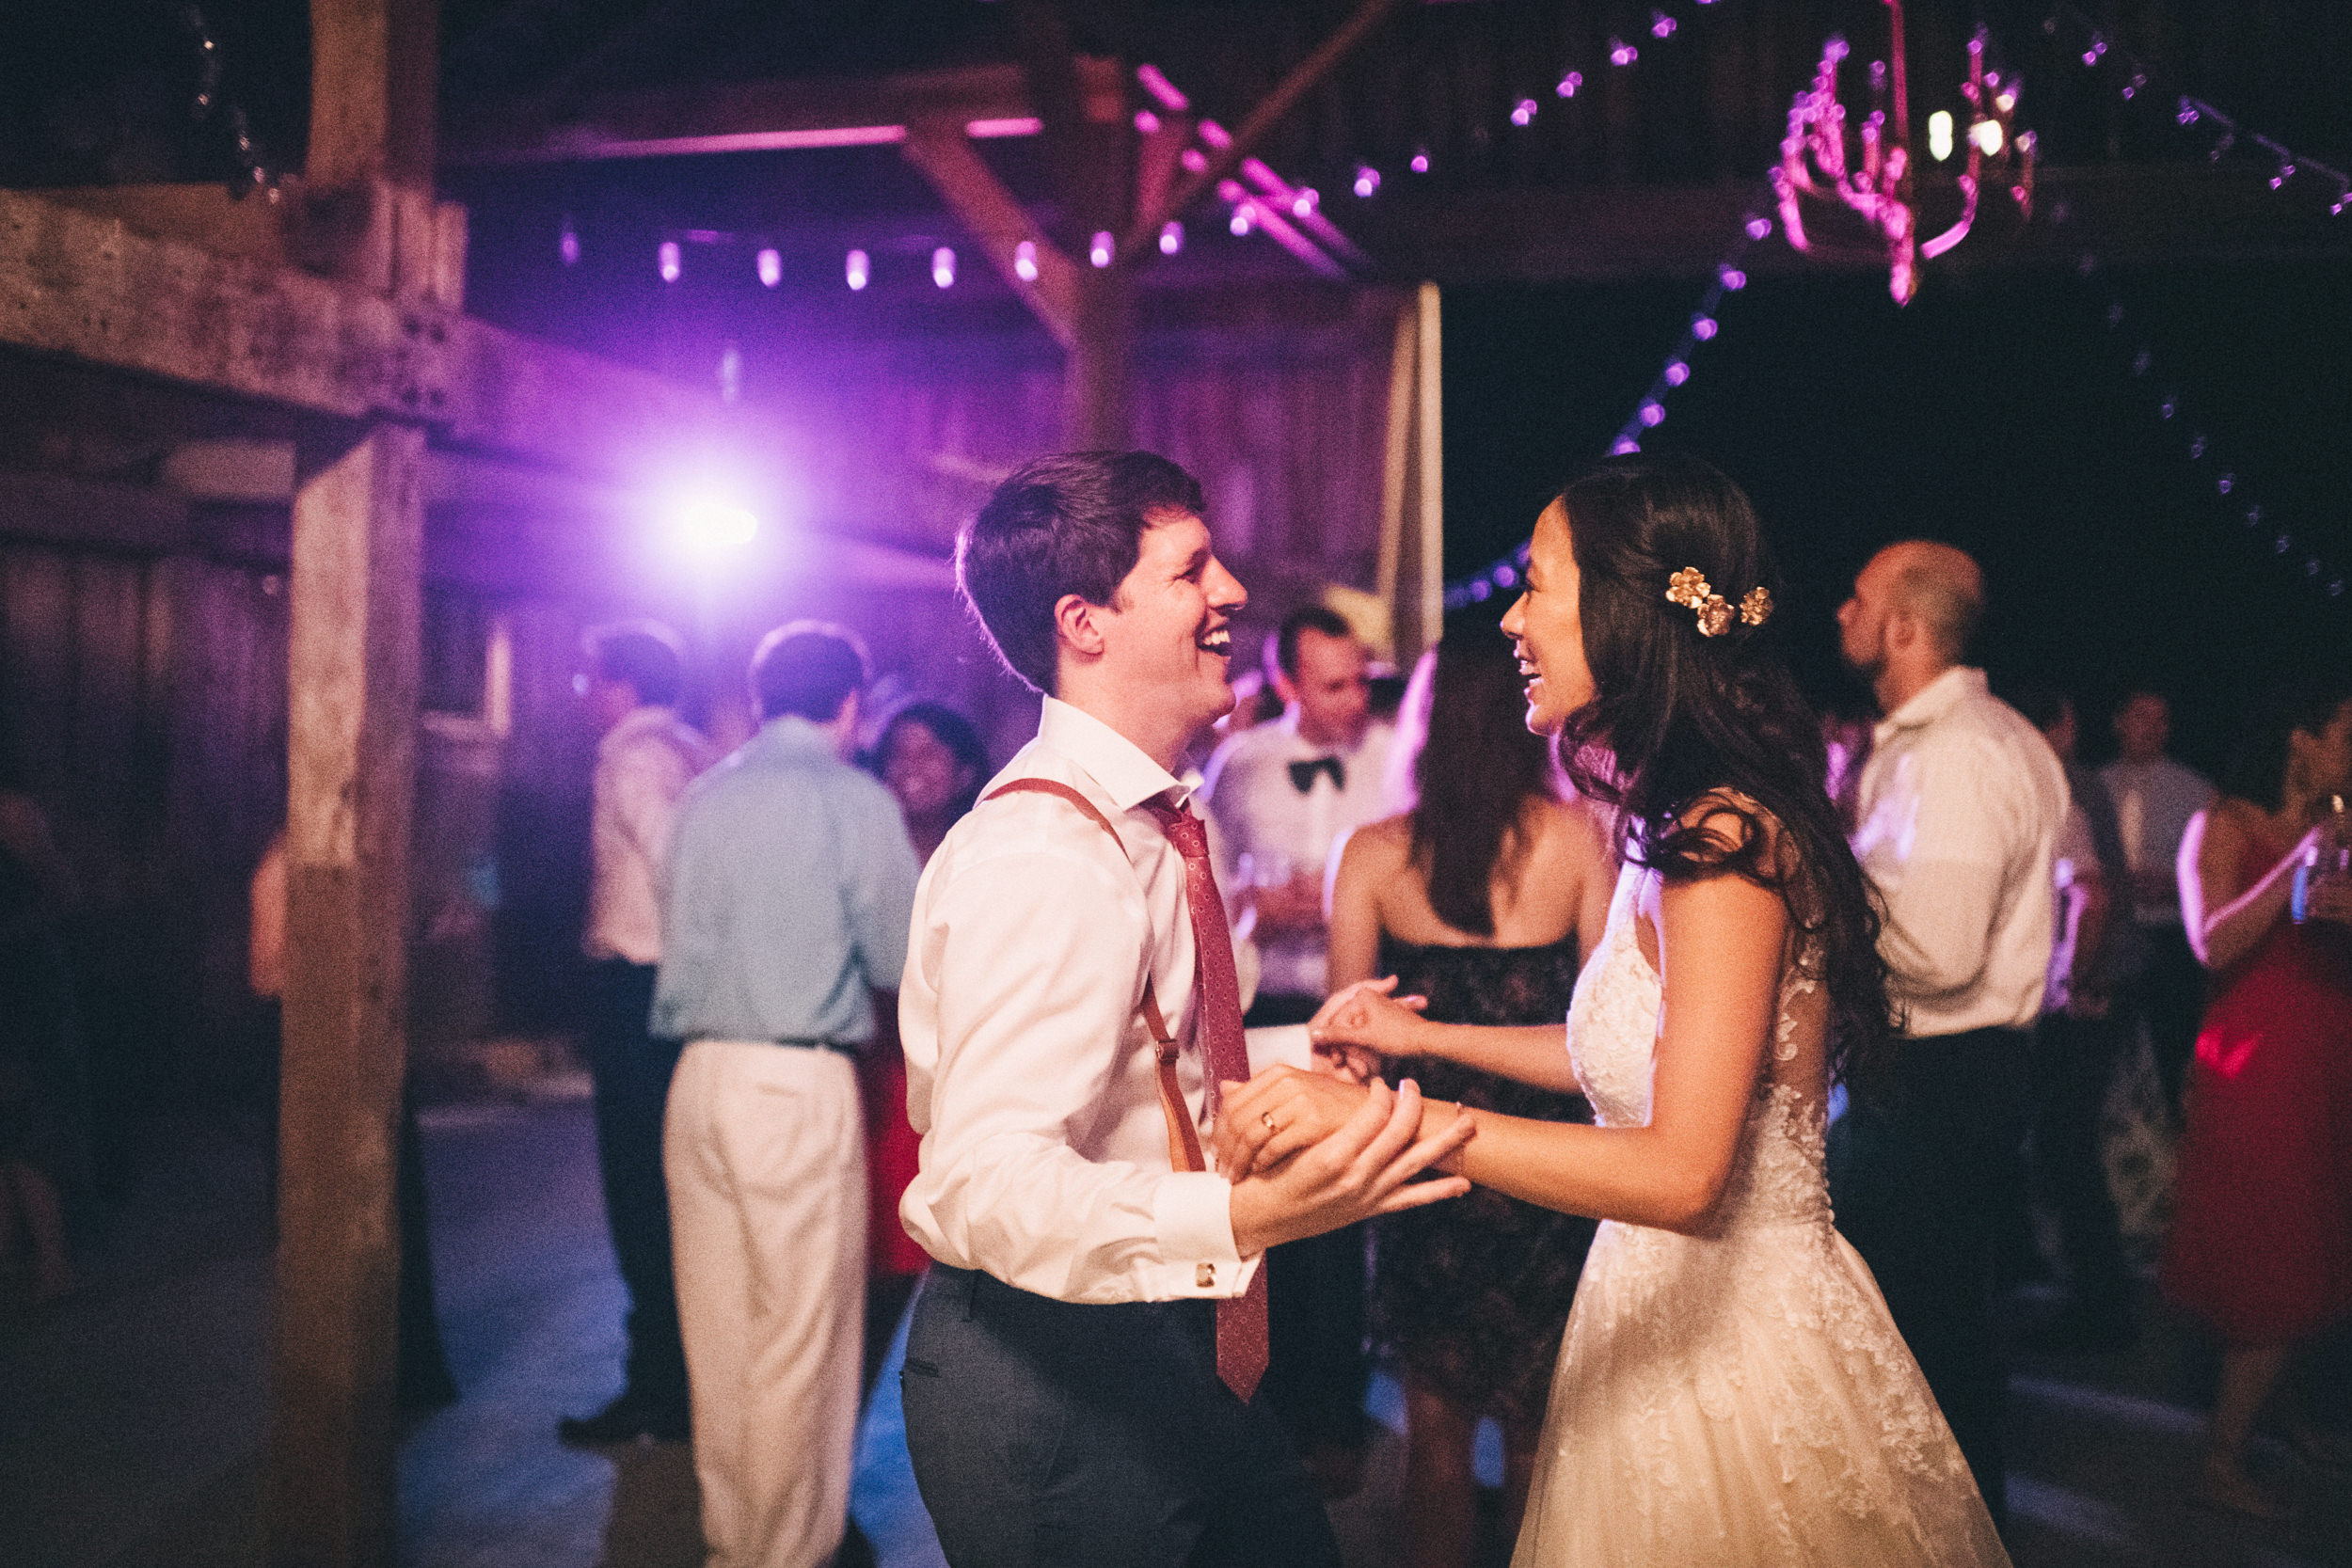 Louisville-Kentucky-Wedding-and-Elopement-Photographer-Sarah-Katherine-Davis-Photography-Summer-Jewel-Toned-Wedding-Chineese-Tea-Ceremony-Warrenwood-Manor-Danville-1102.jpg